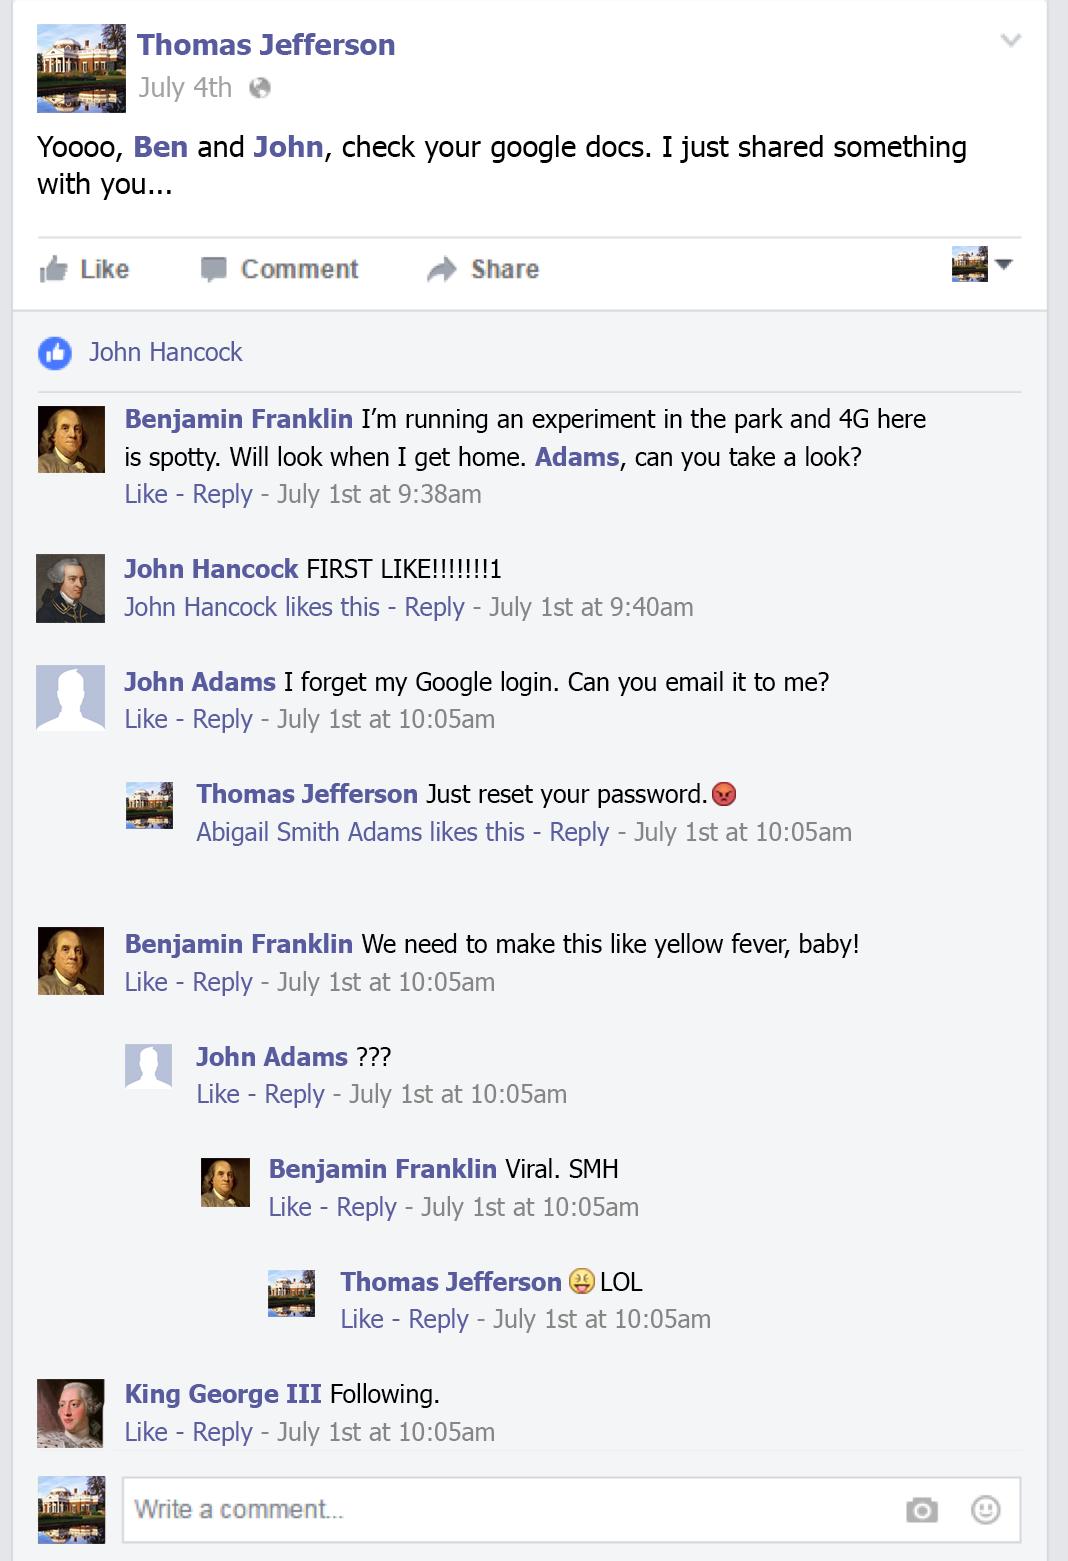 Thomas Jefferson's social media account